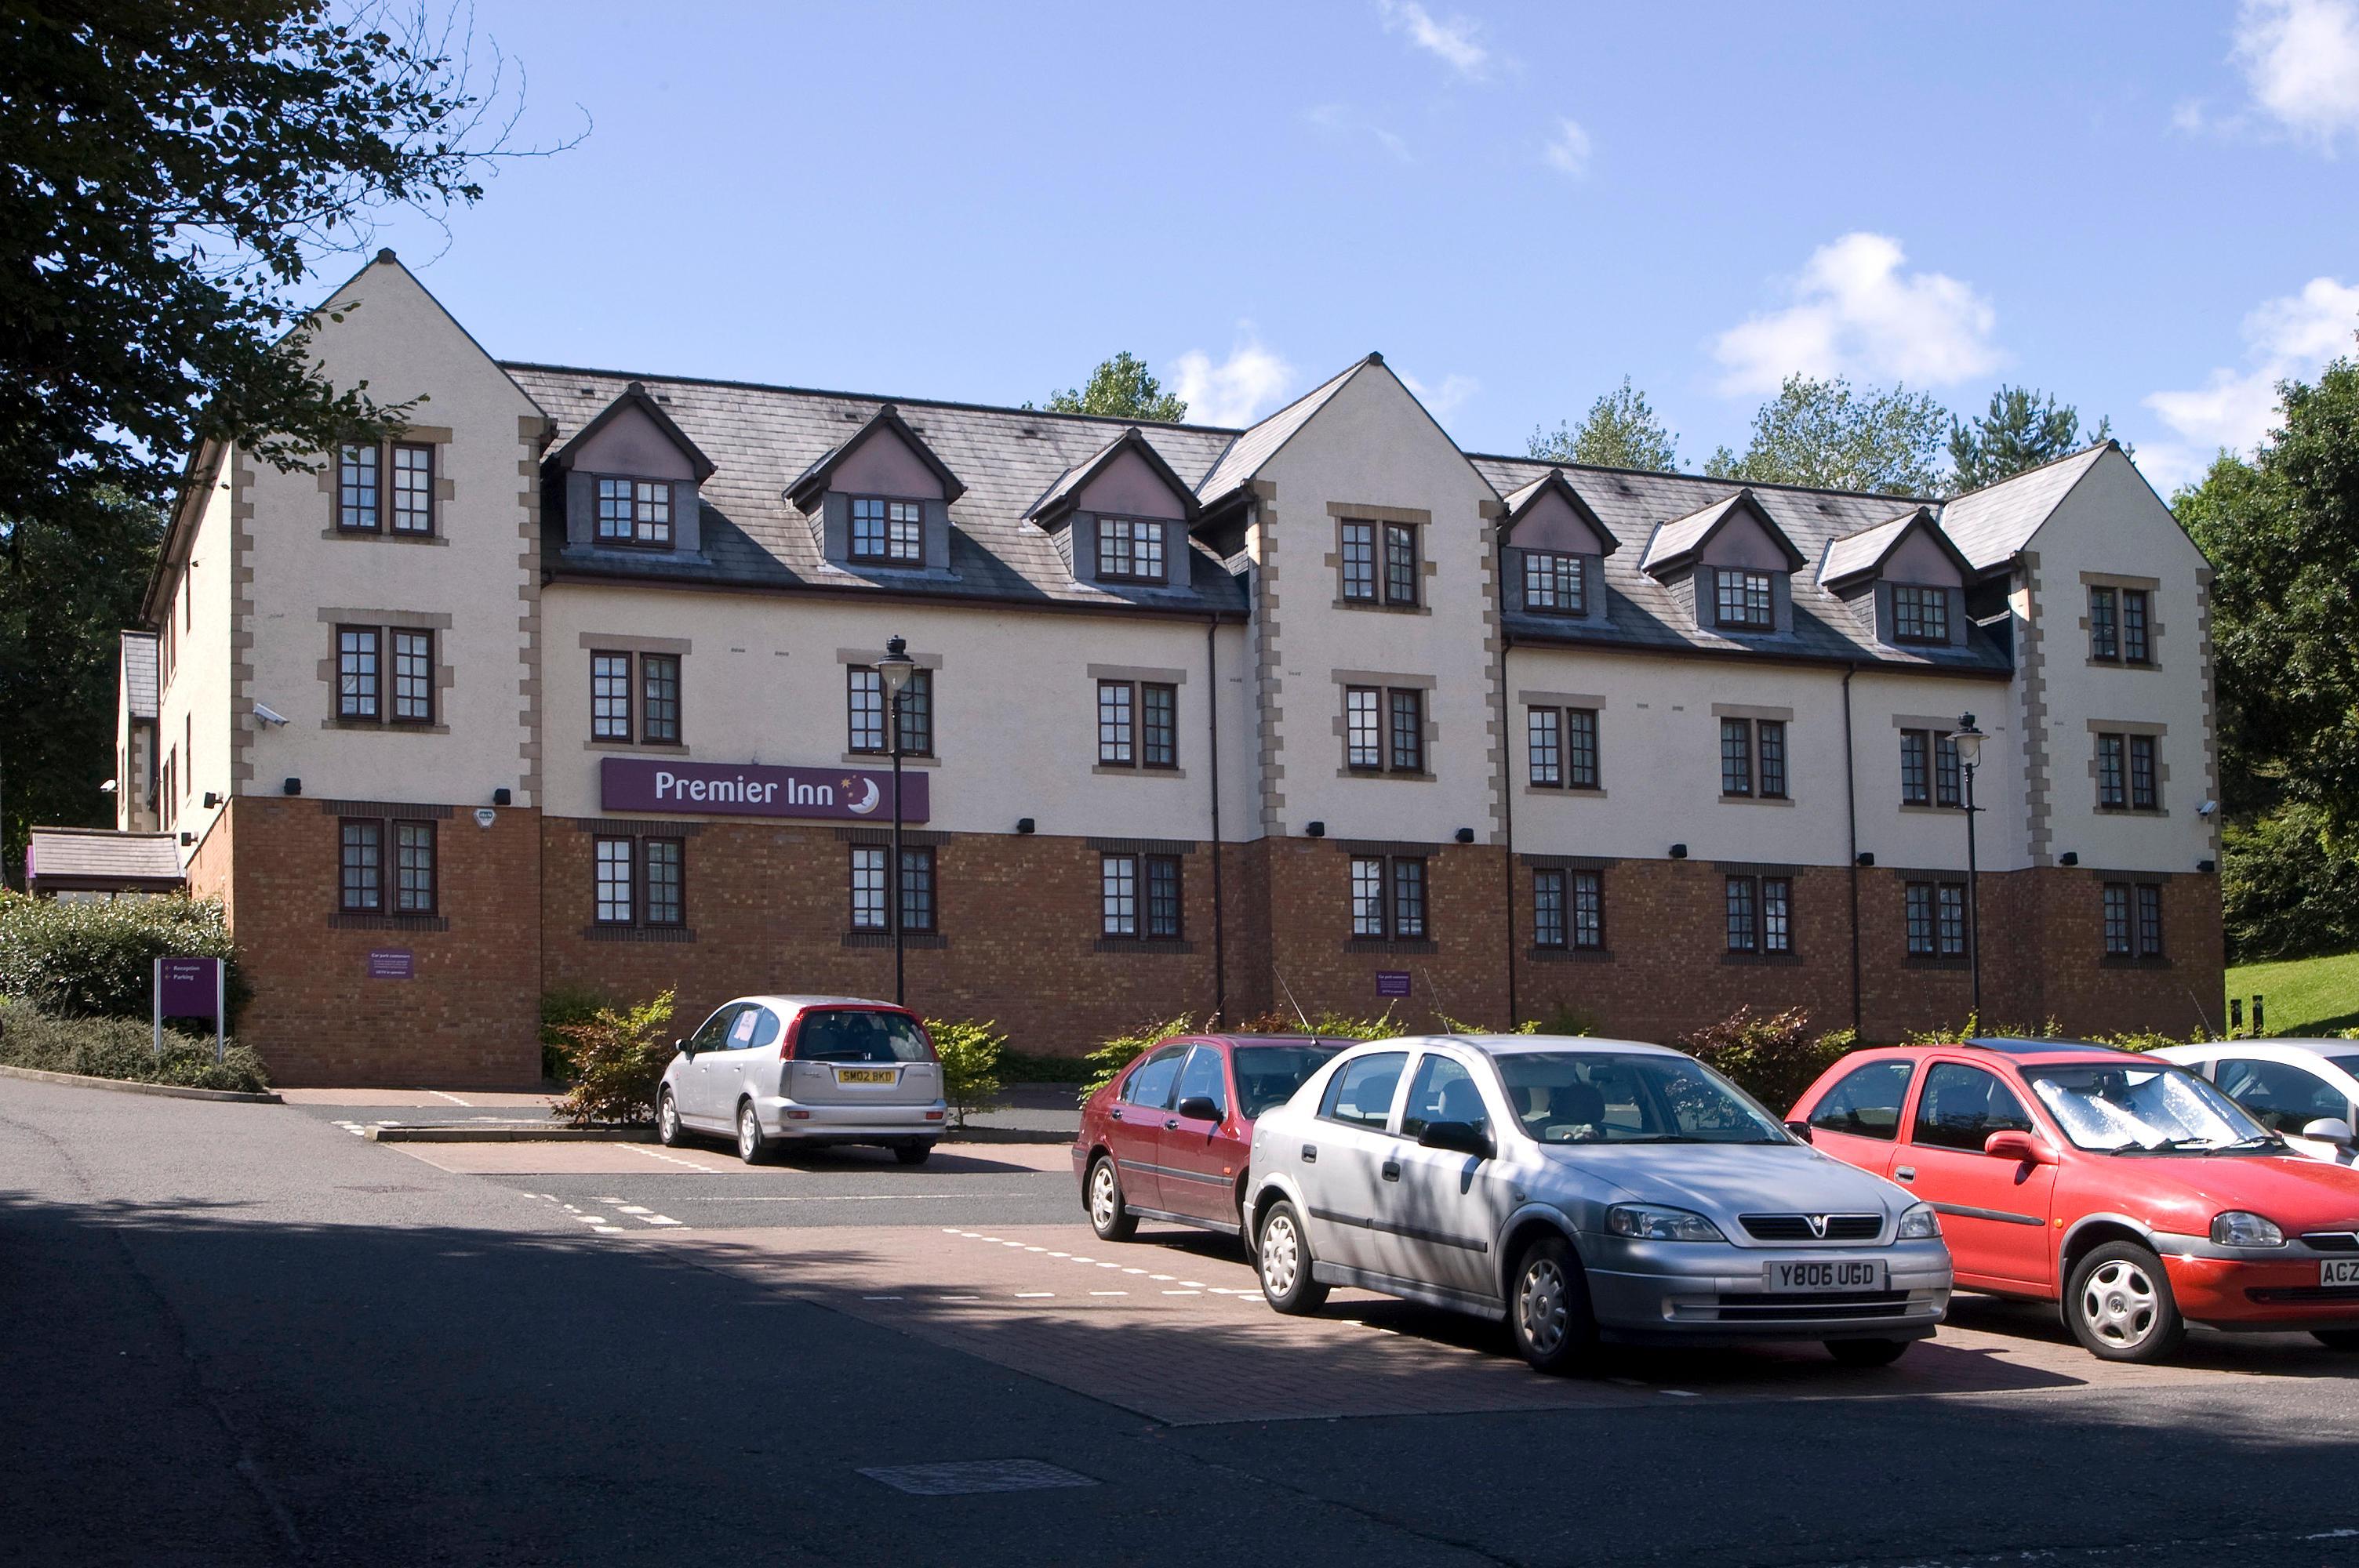 Premier Inn Glasgow Bearsden hotel